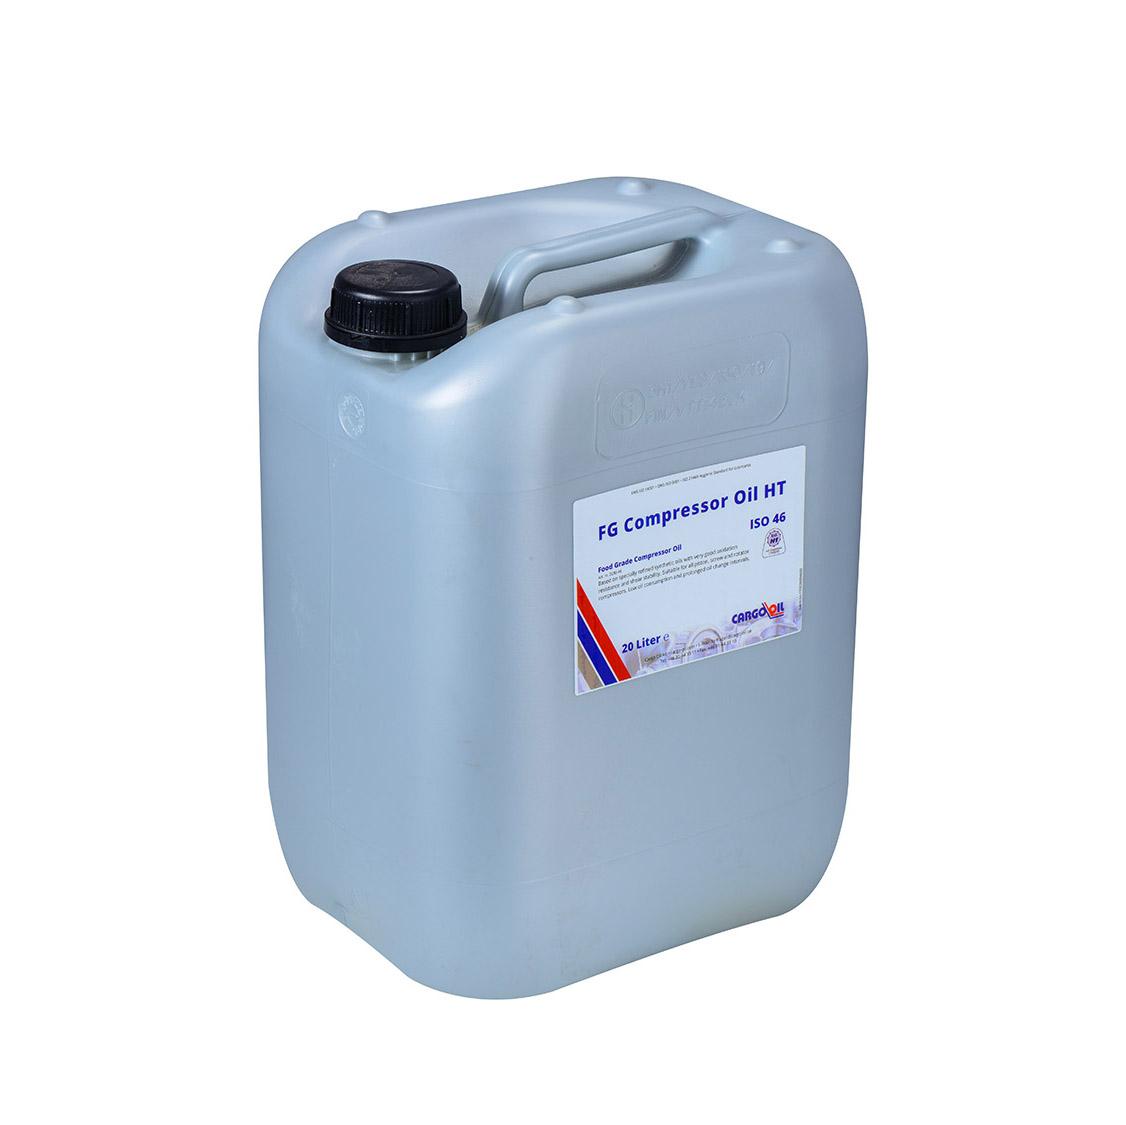 FG Compressor Oil HT 食品级空气压缩机油